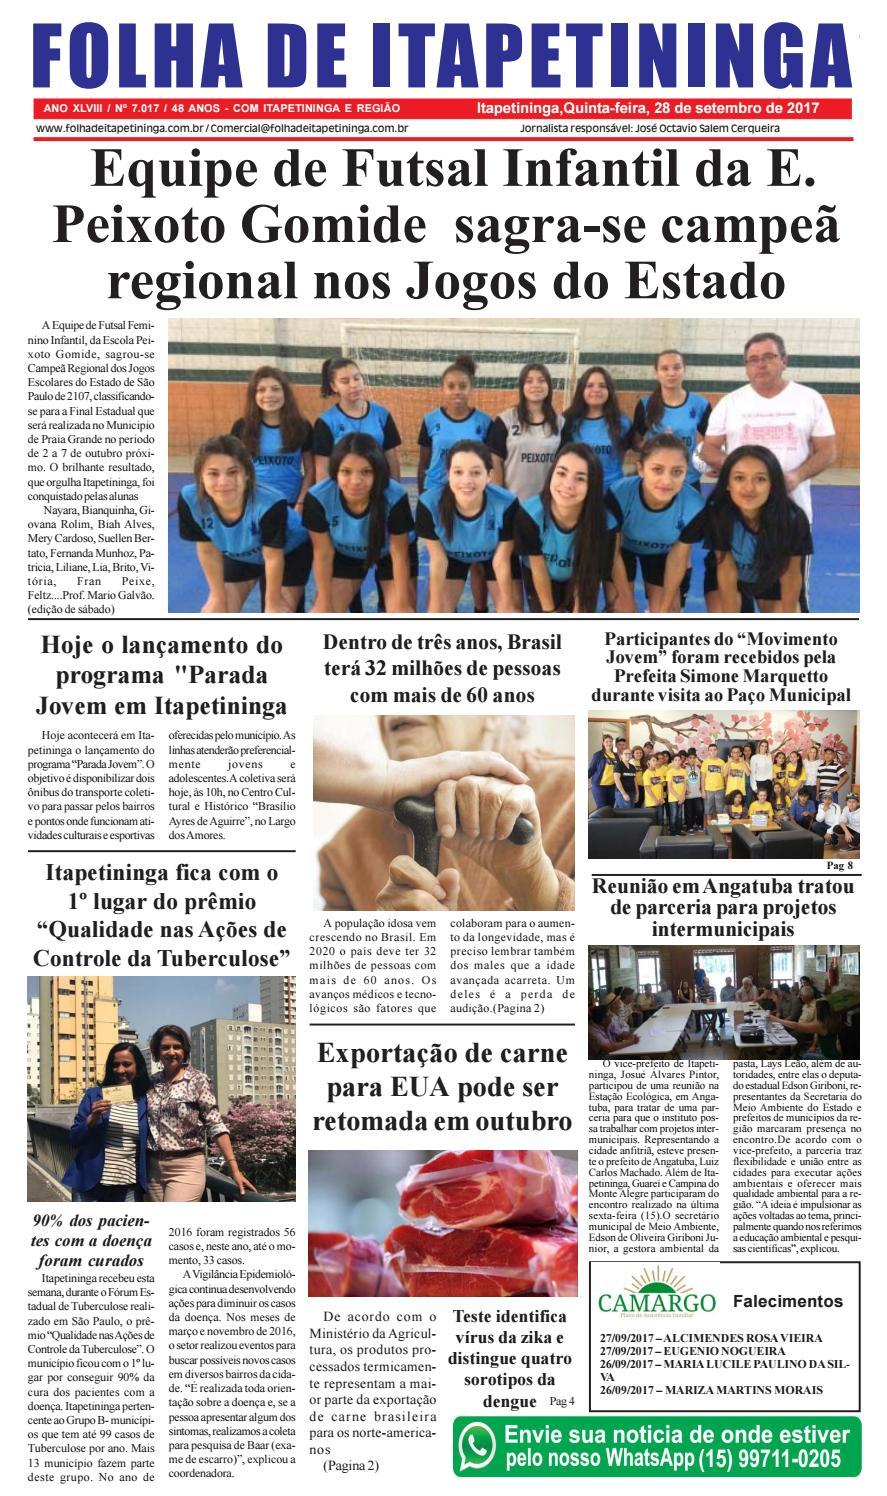 0b4a288deb Folha de Itapetininga 28 09 2017 by Jornal Folha de Itapetininga - issuu